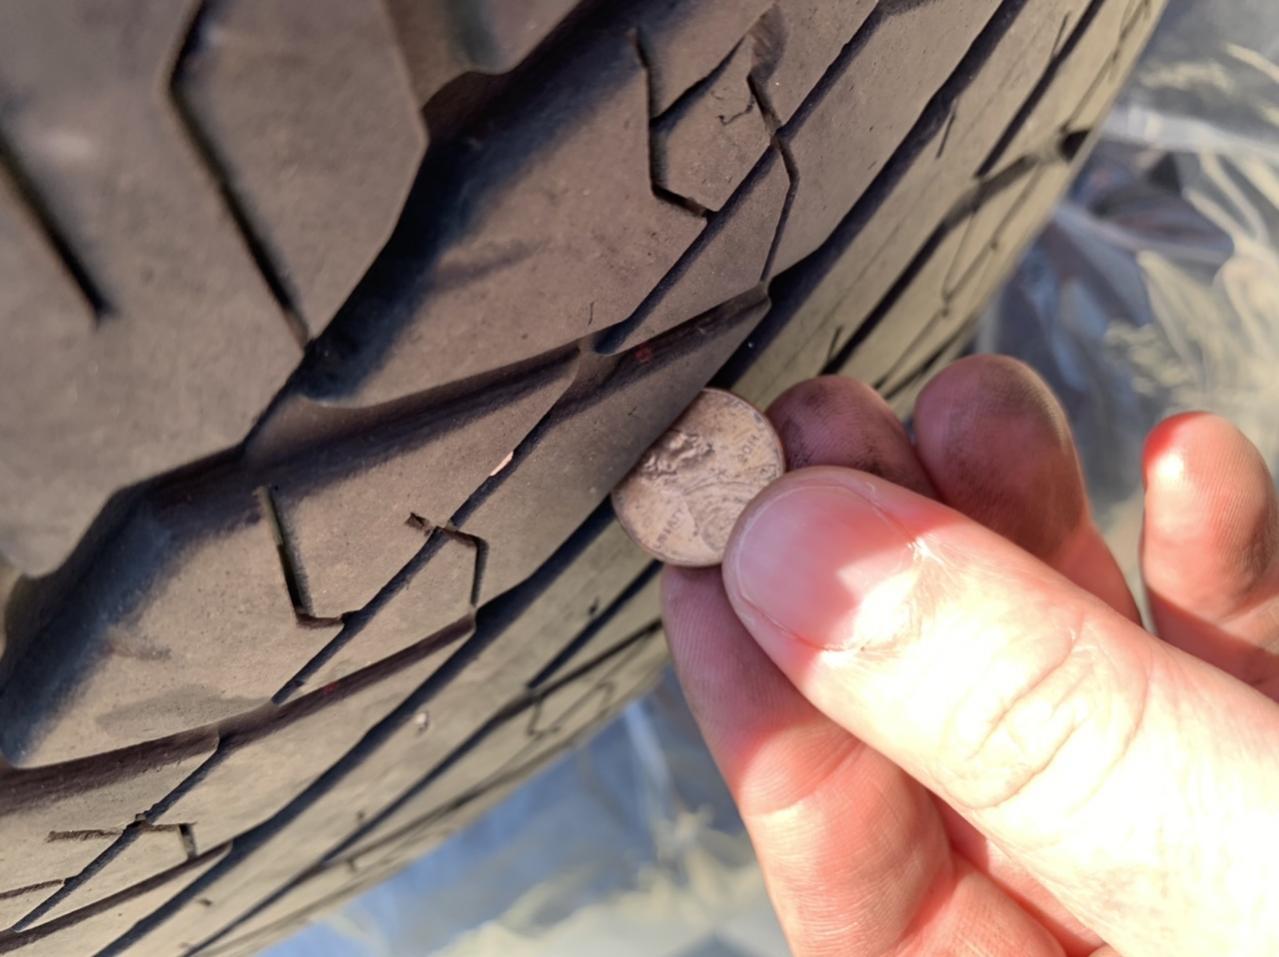 SOLD: 5th Gen TRD Off Road Wheels/Tires - 0 - Grand Rapids, MI-b3648424-131f-44c3-8016-80865177a863-jpg